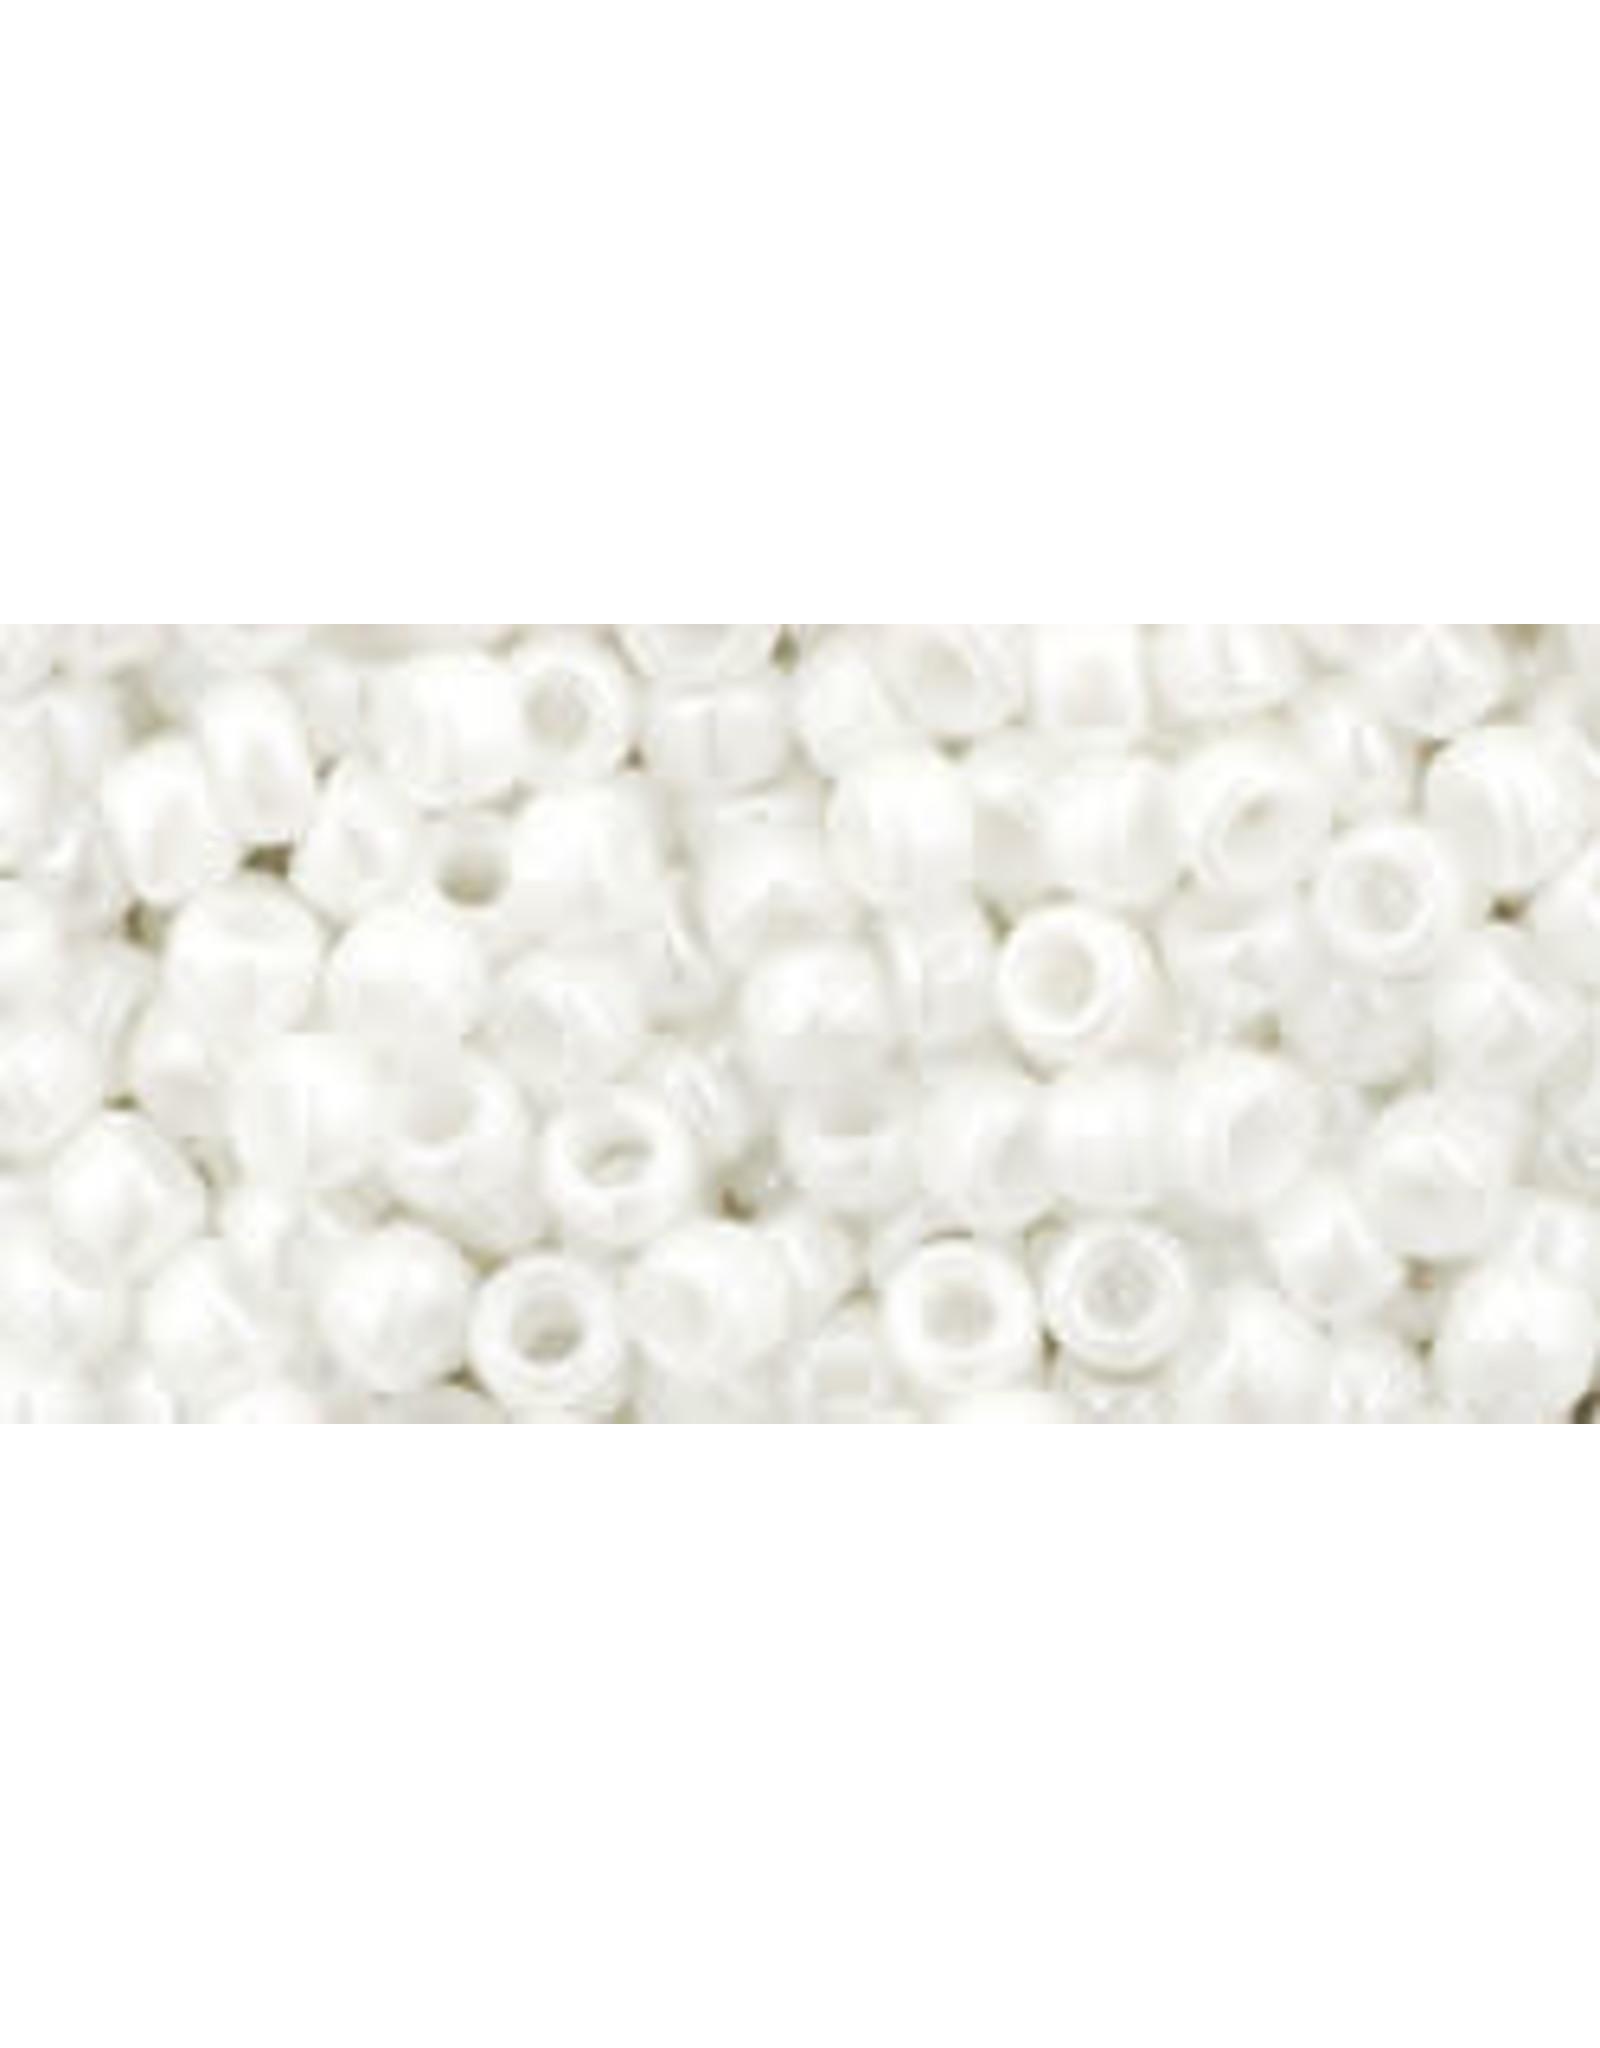 Toho 121 8  Round 6g Opaque White Lustre